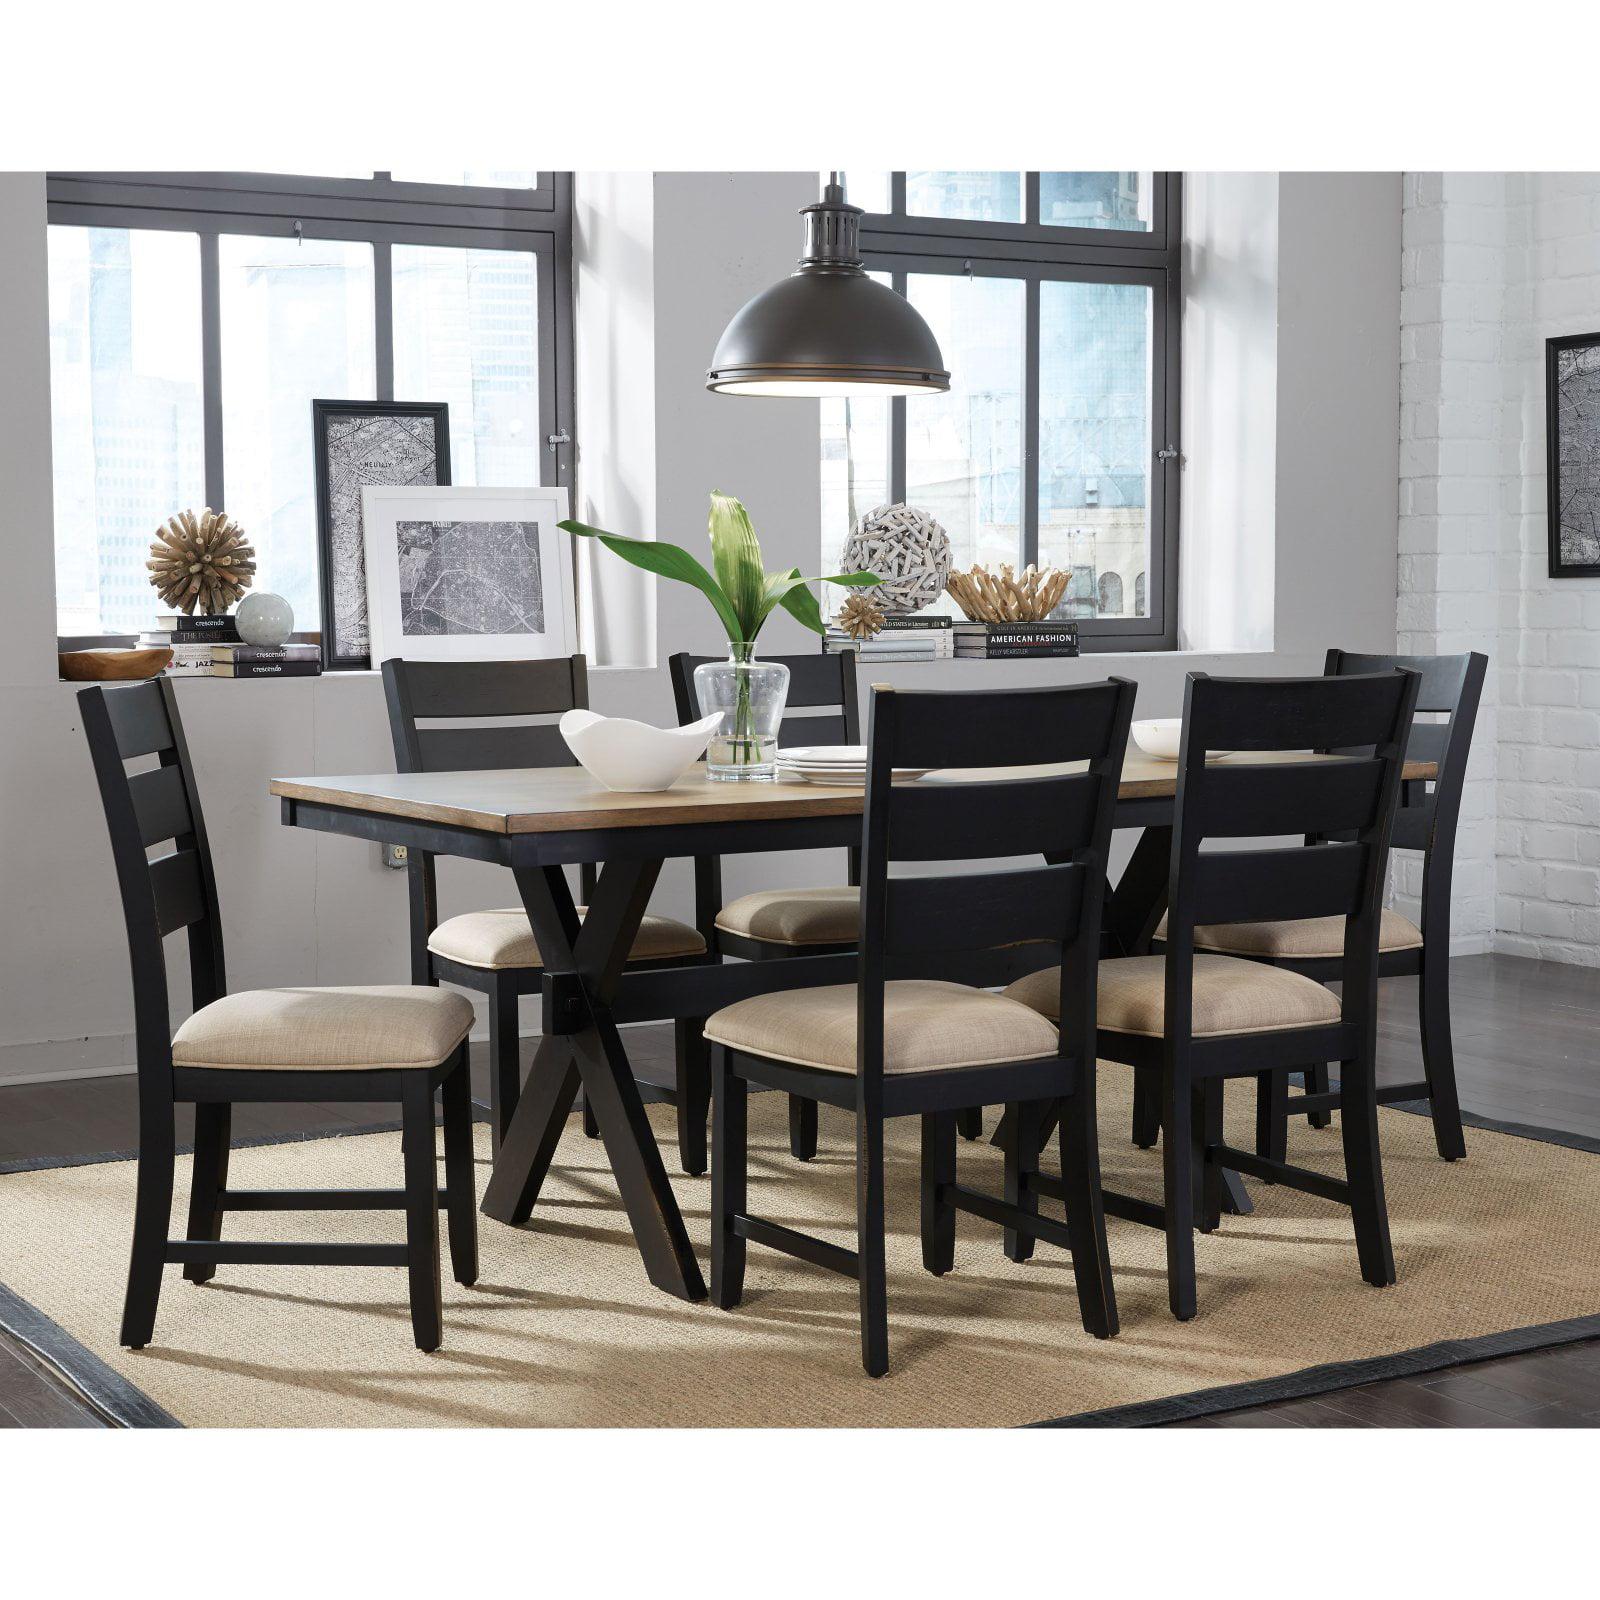 Standard Furniture Braydon 7-Piece Dining Table Set